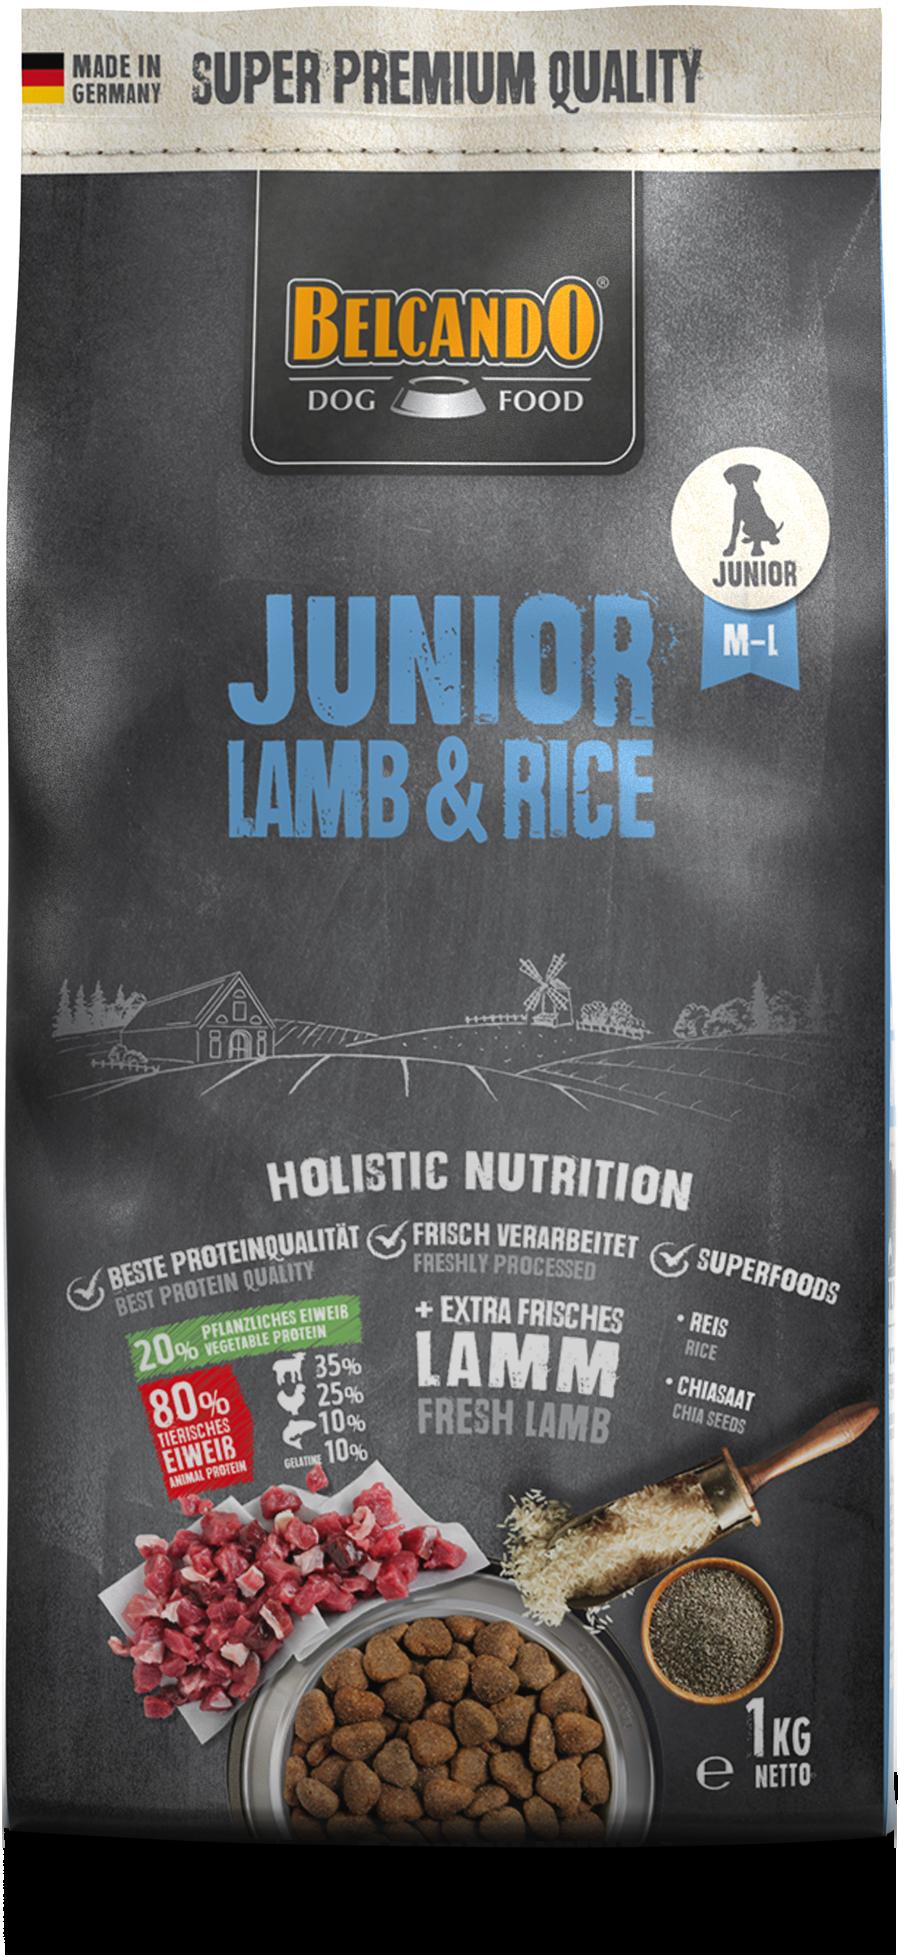 Belcando-Junior-Lamb-Rice-1kg-front